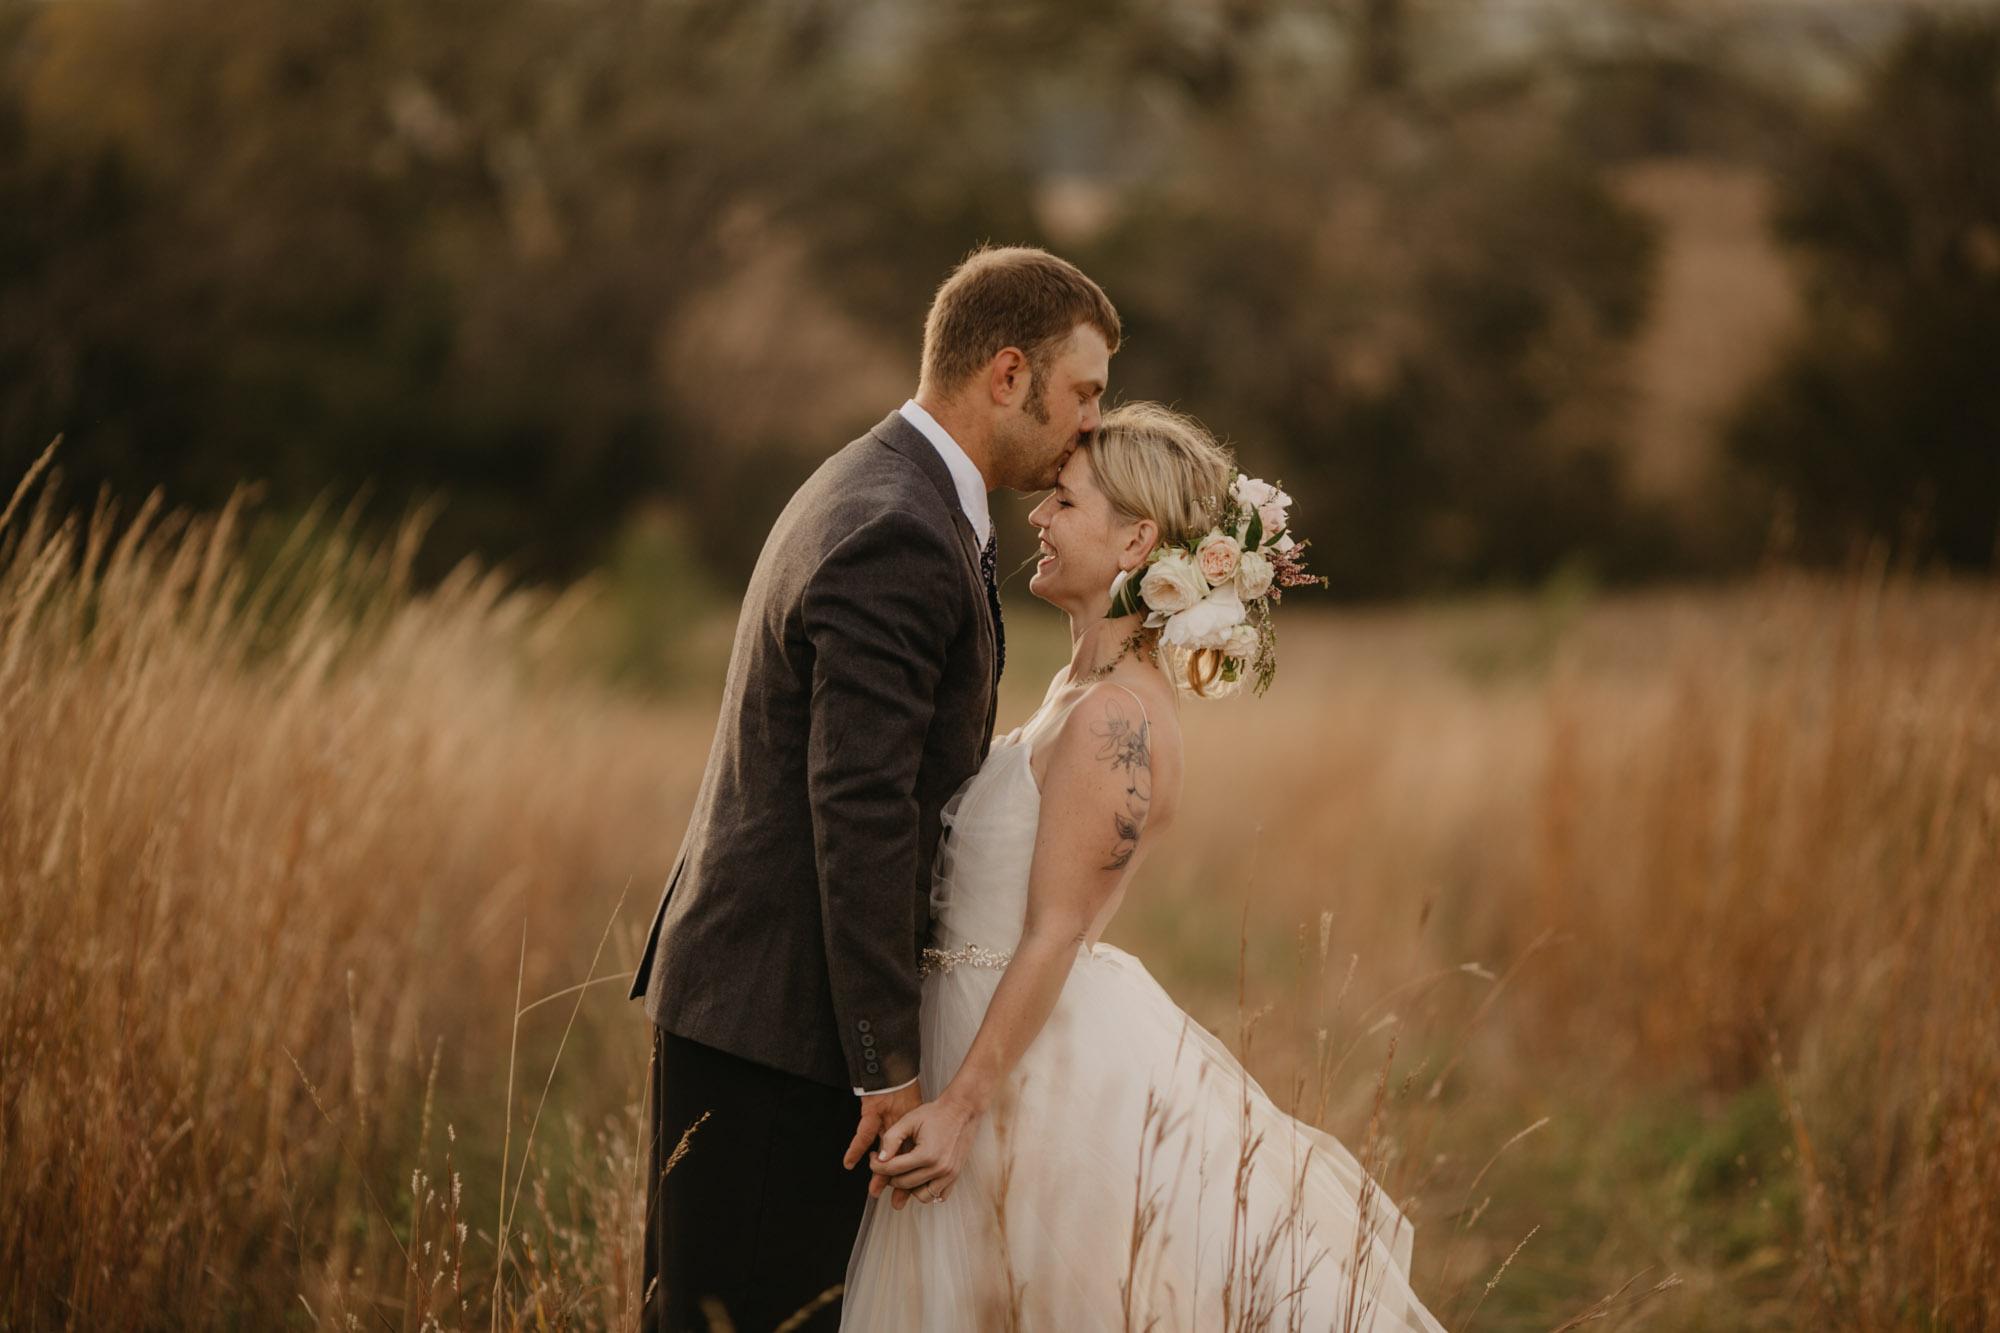 omaha-wedding-photographer-meghan-time-40.jpg